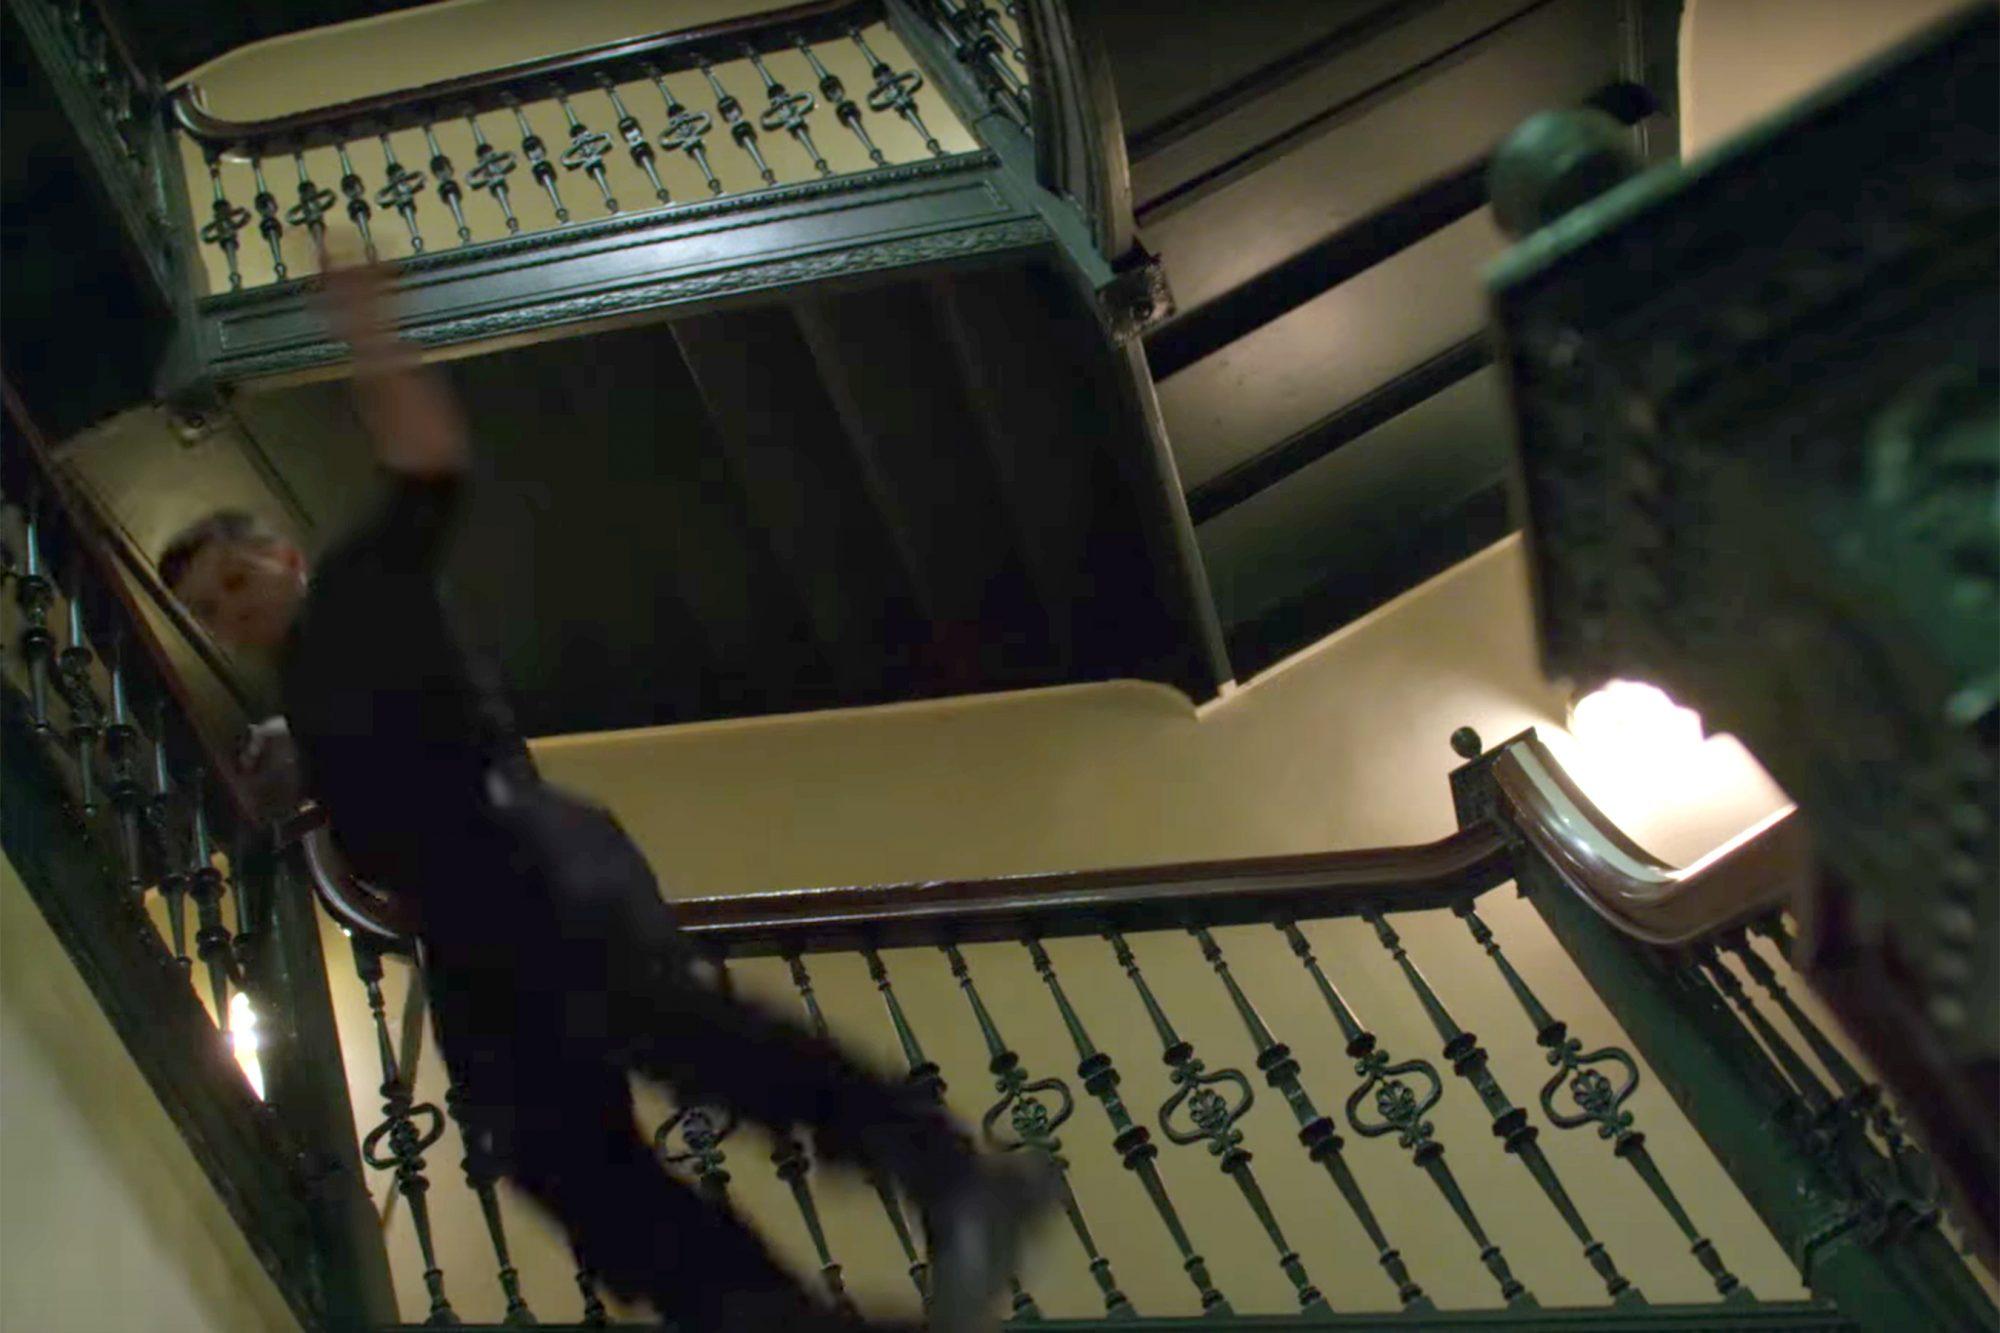 Die Hard, Frank Castle-style